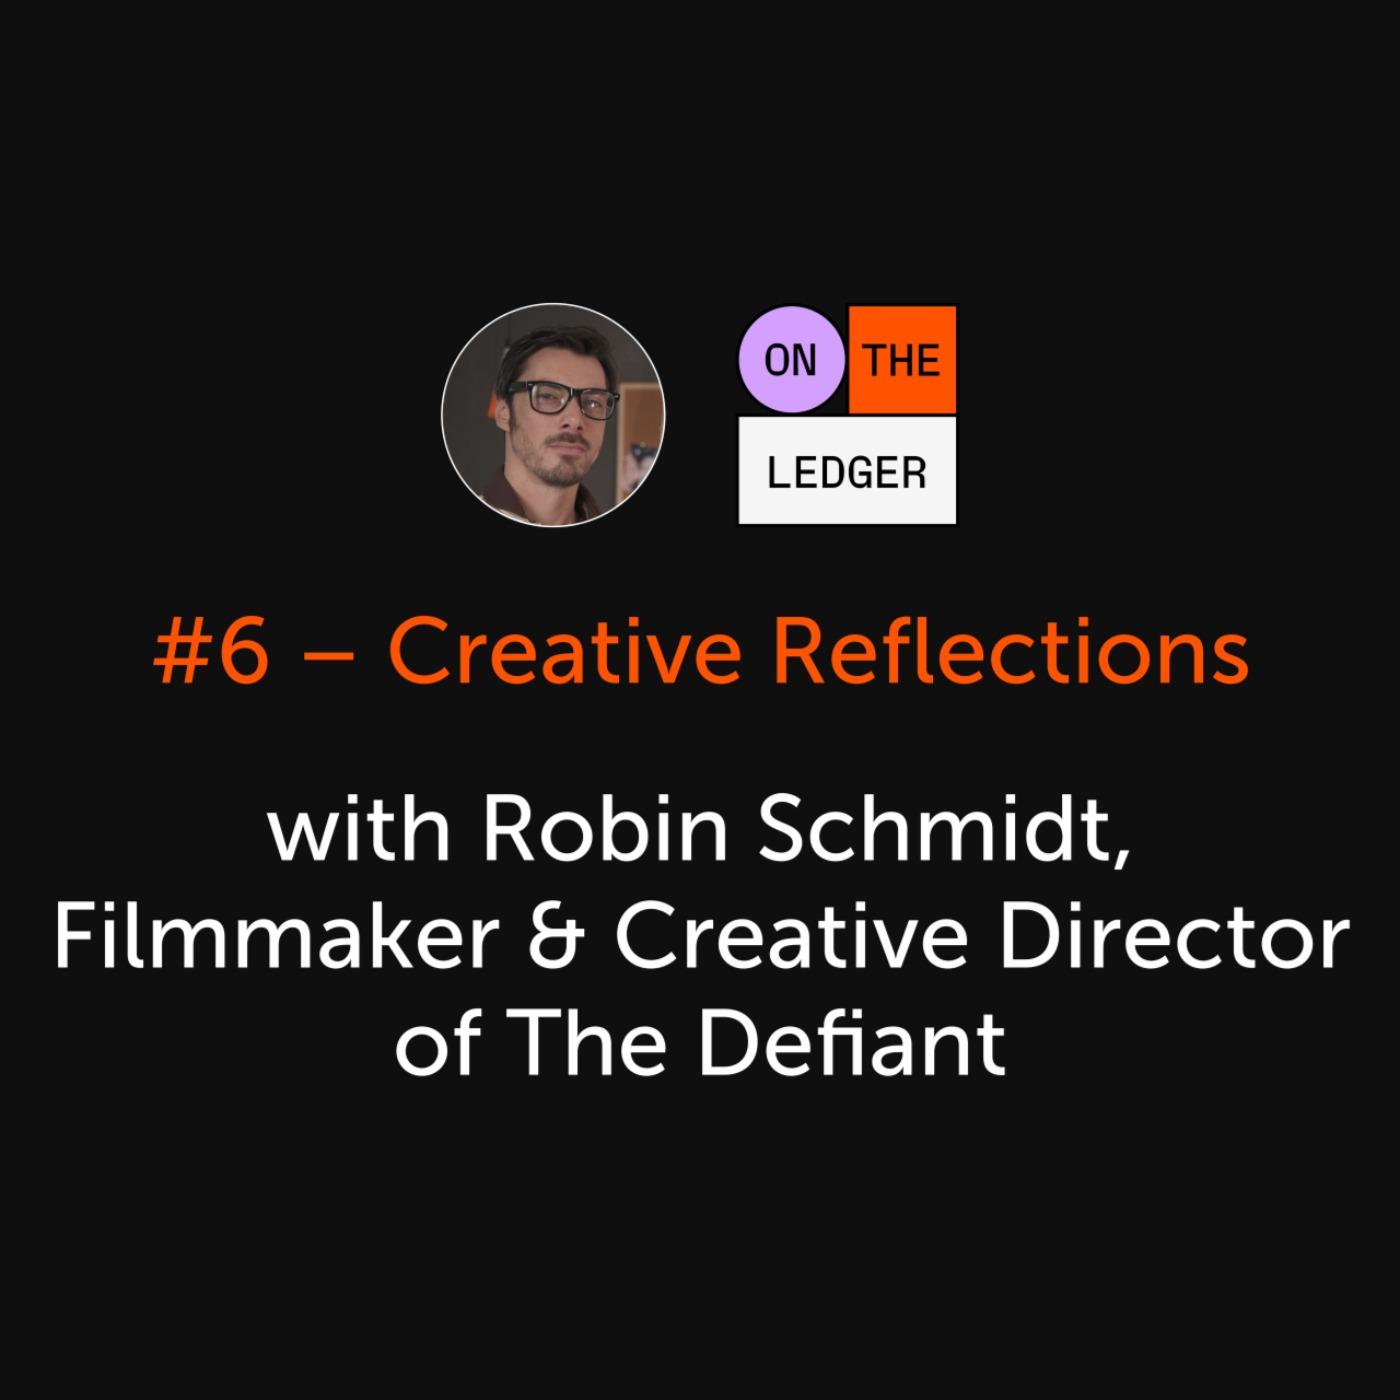 #6 Creative Reflections w/ Robin Schmidt